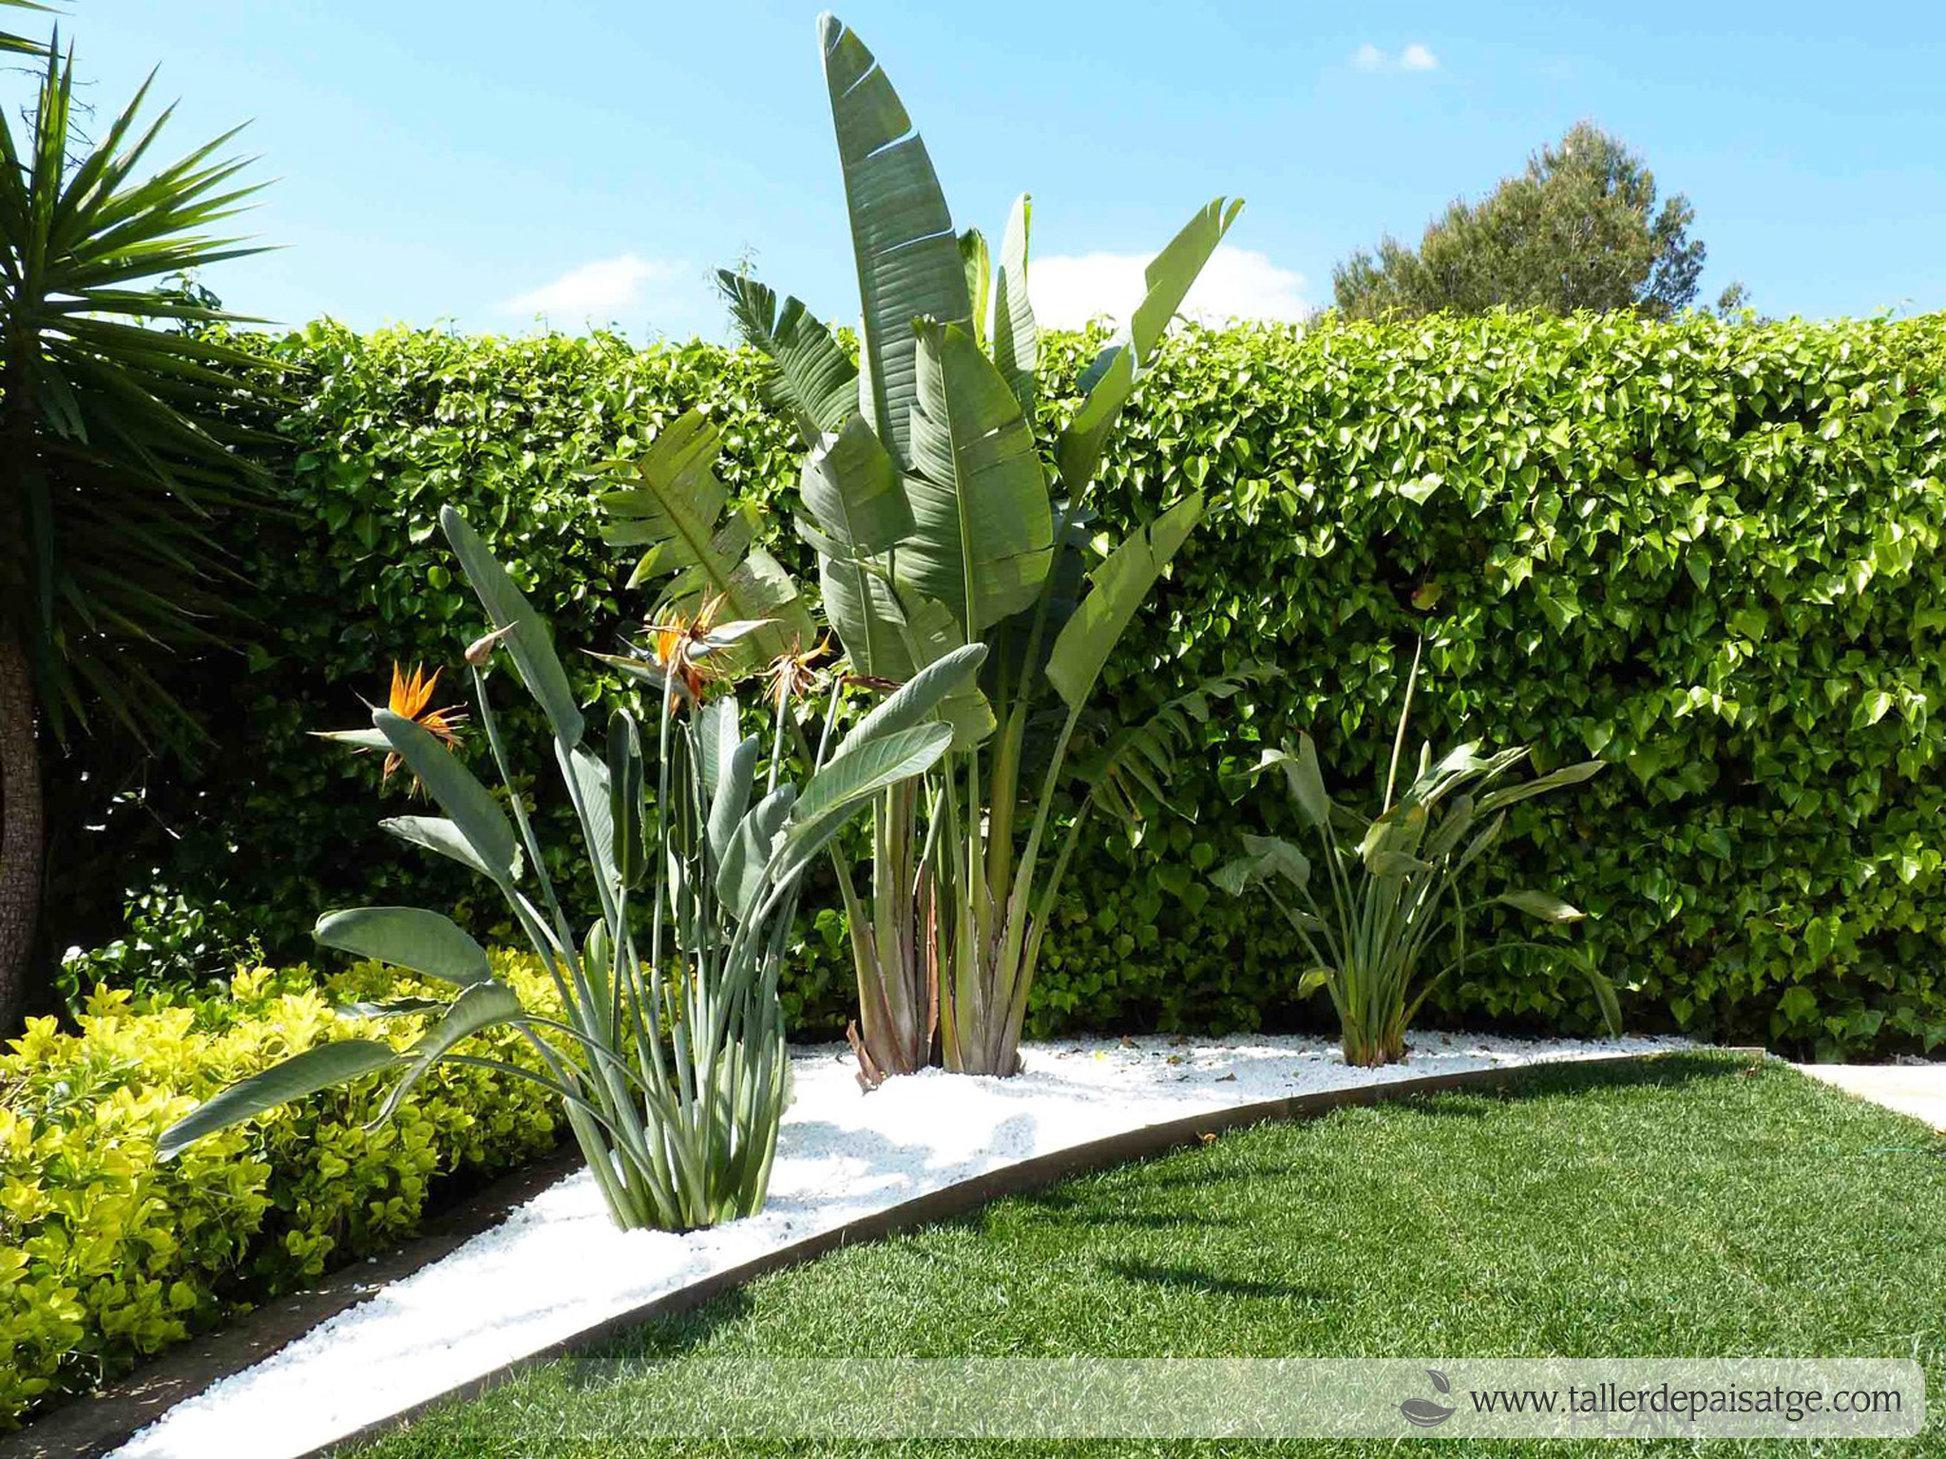 Piscina exterior jardin estilo tropical color verde - Piscina de jardin ...